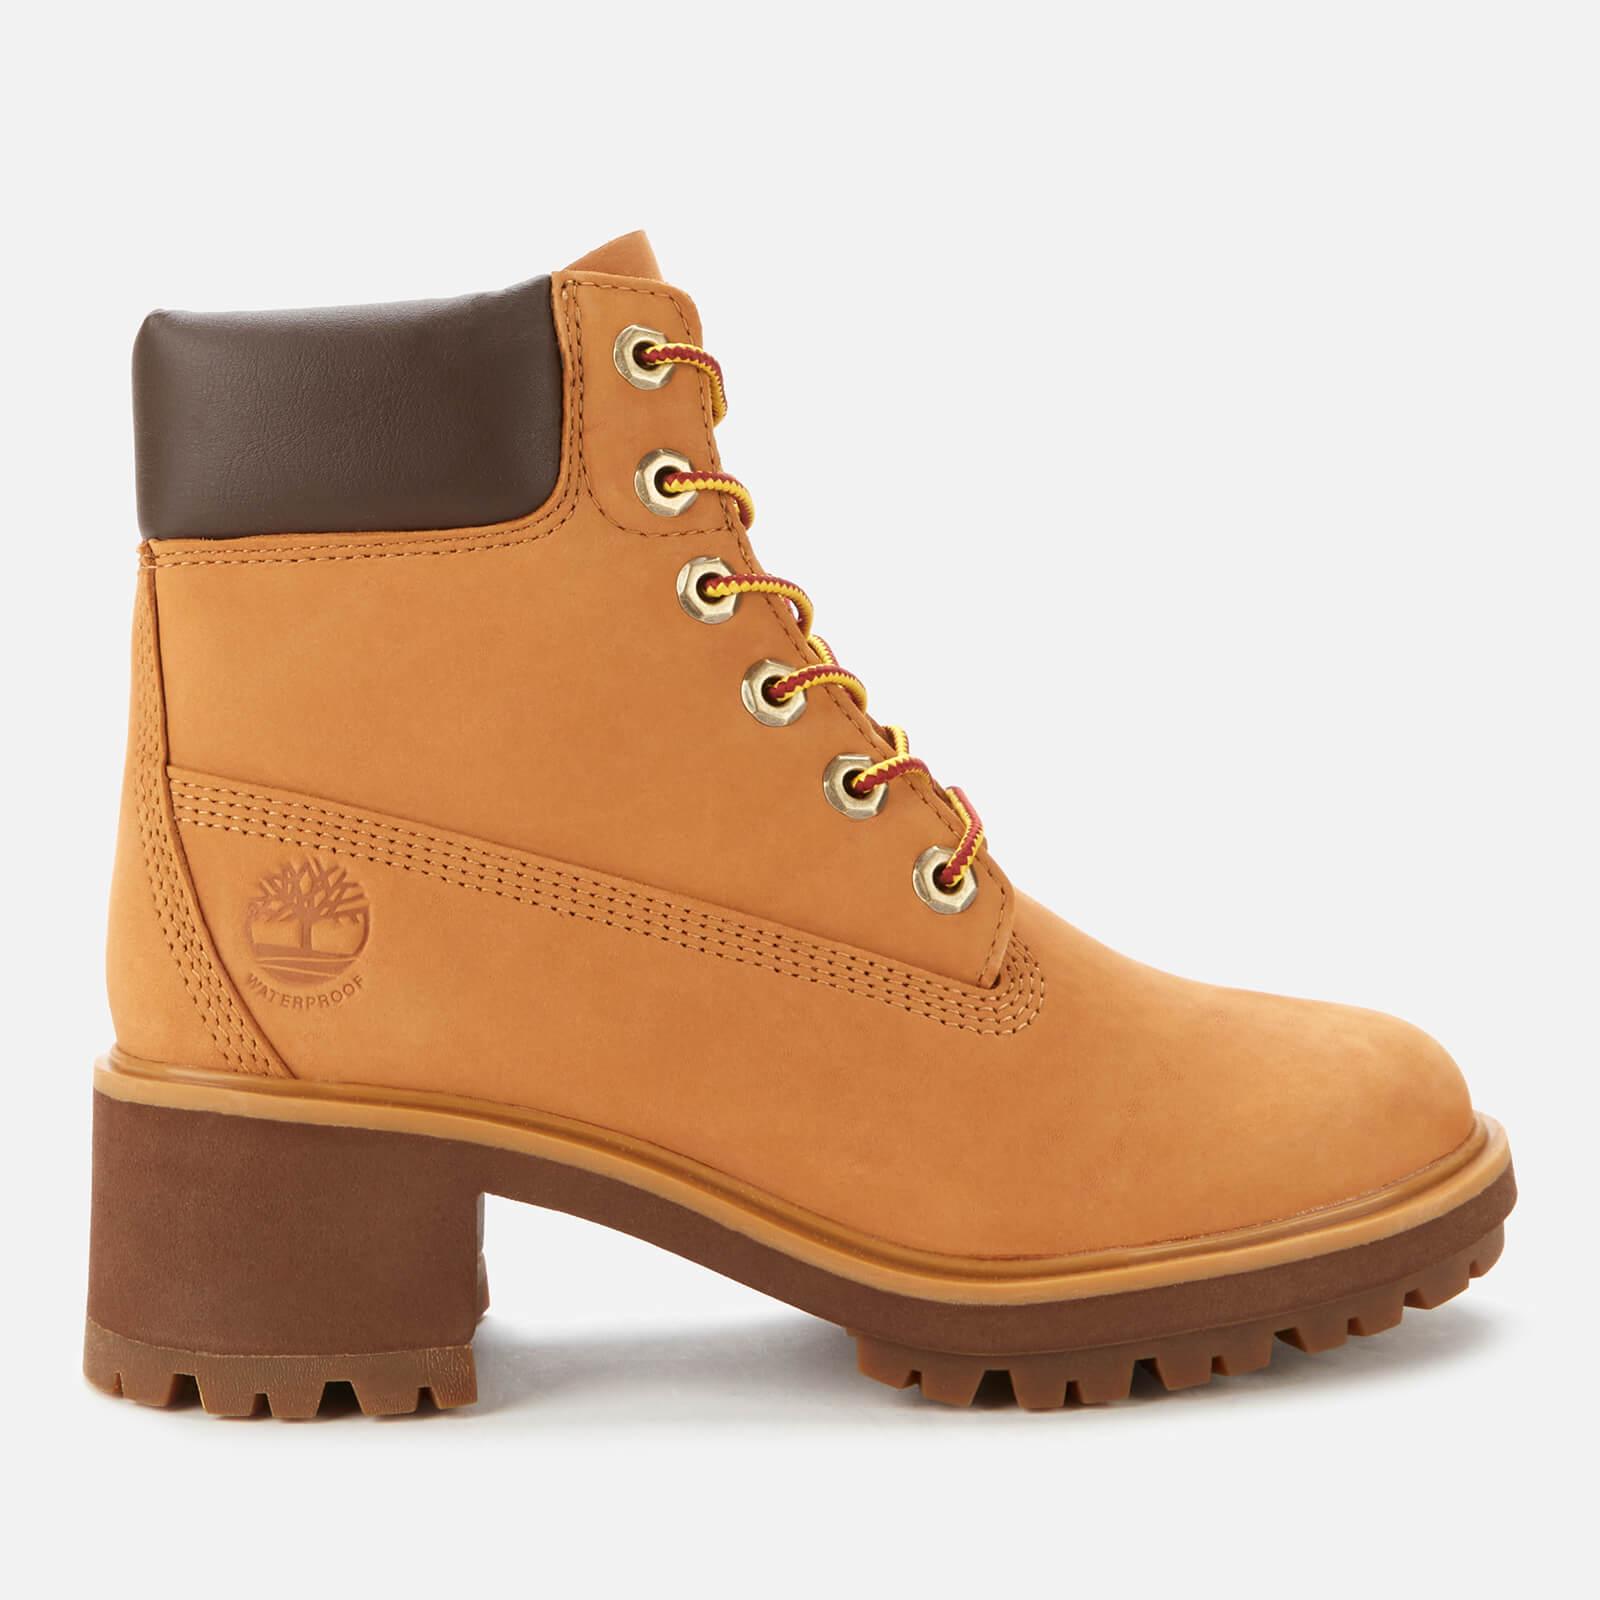 Timberland Women's Kinsley 6 Inch Waterproof Heeled Boots - Wheat - Uk 4